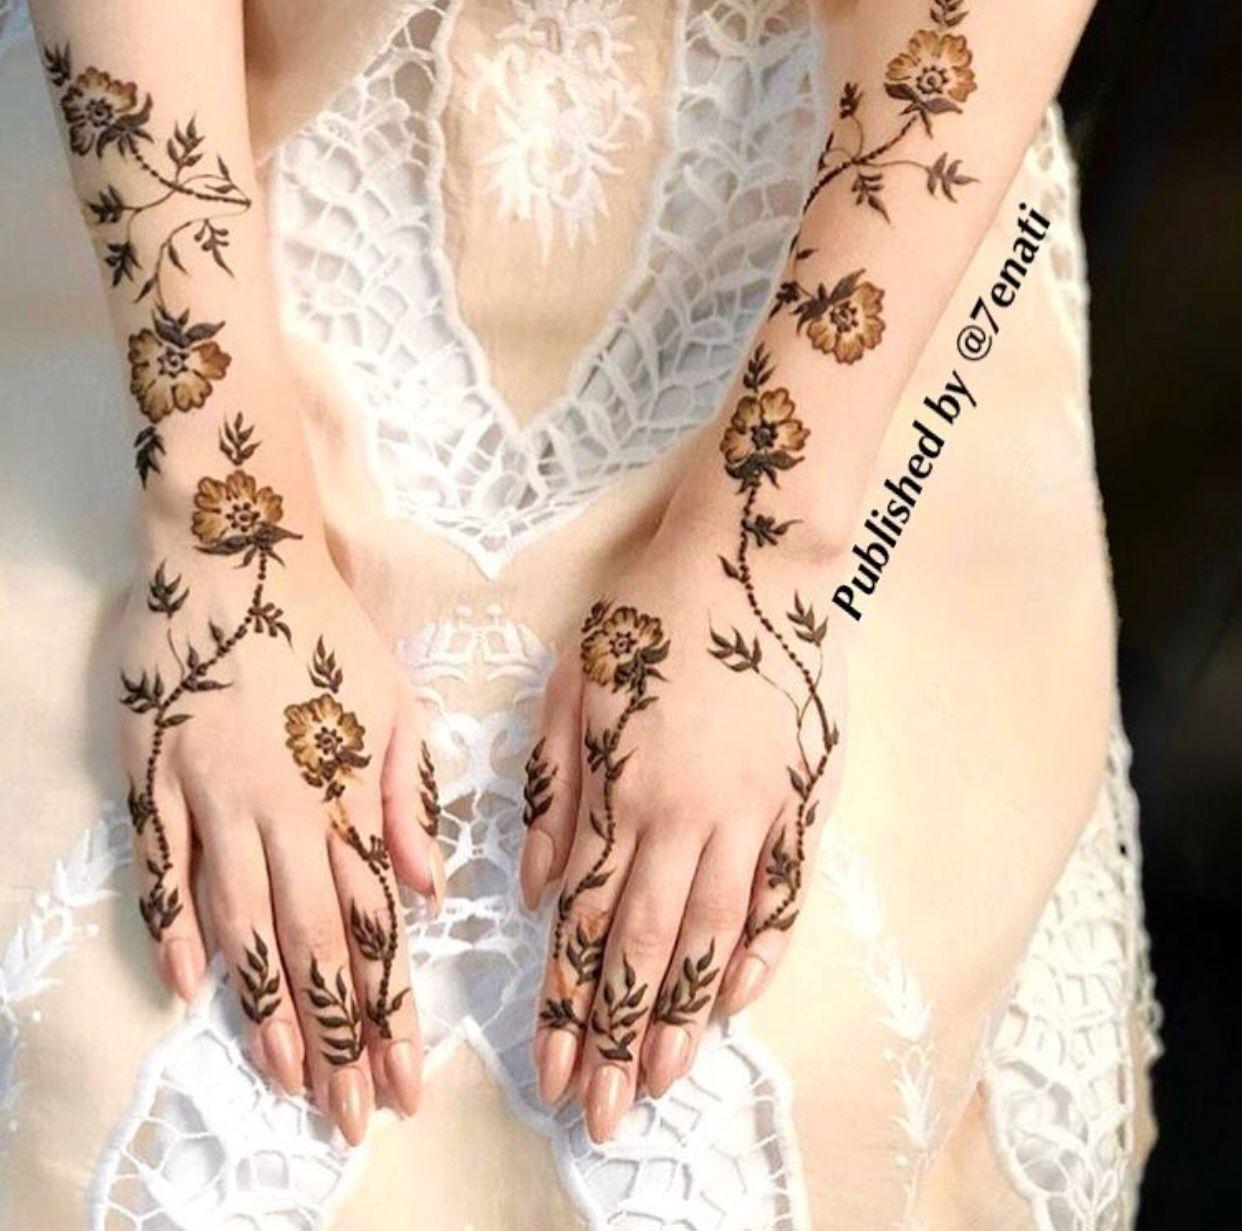 Henna Alain 0553300632 Henna Designs Hand Henna Tattoo Designs Henna Tattoo Hand